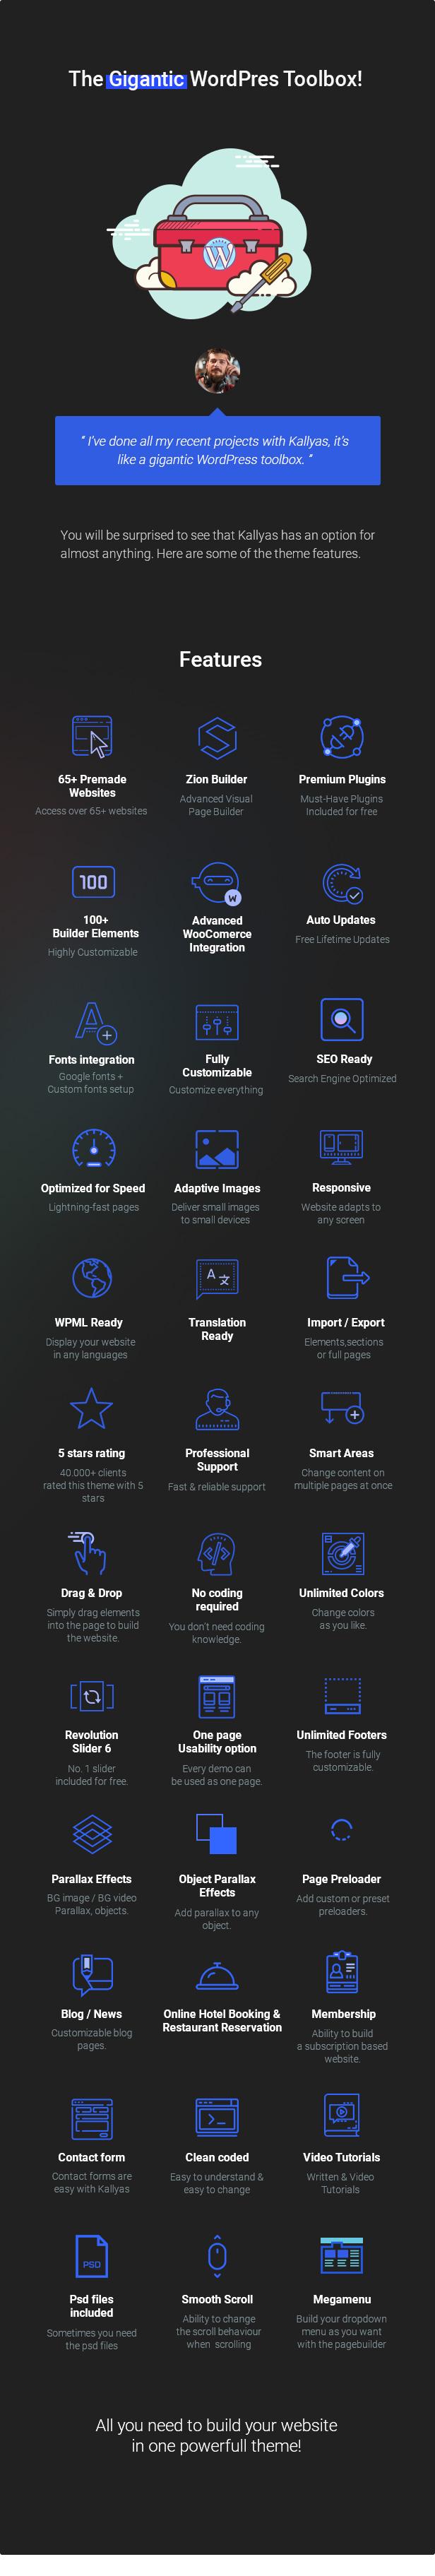 11.gigantic toolbox 2 - KALLYAS - Creative eCommerce Multi-Purpose WordPress Theme